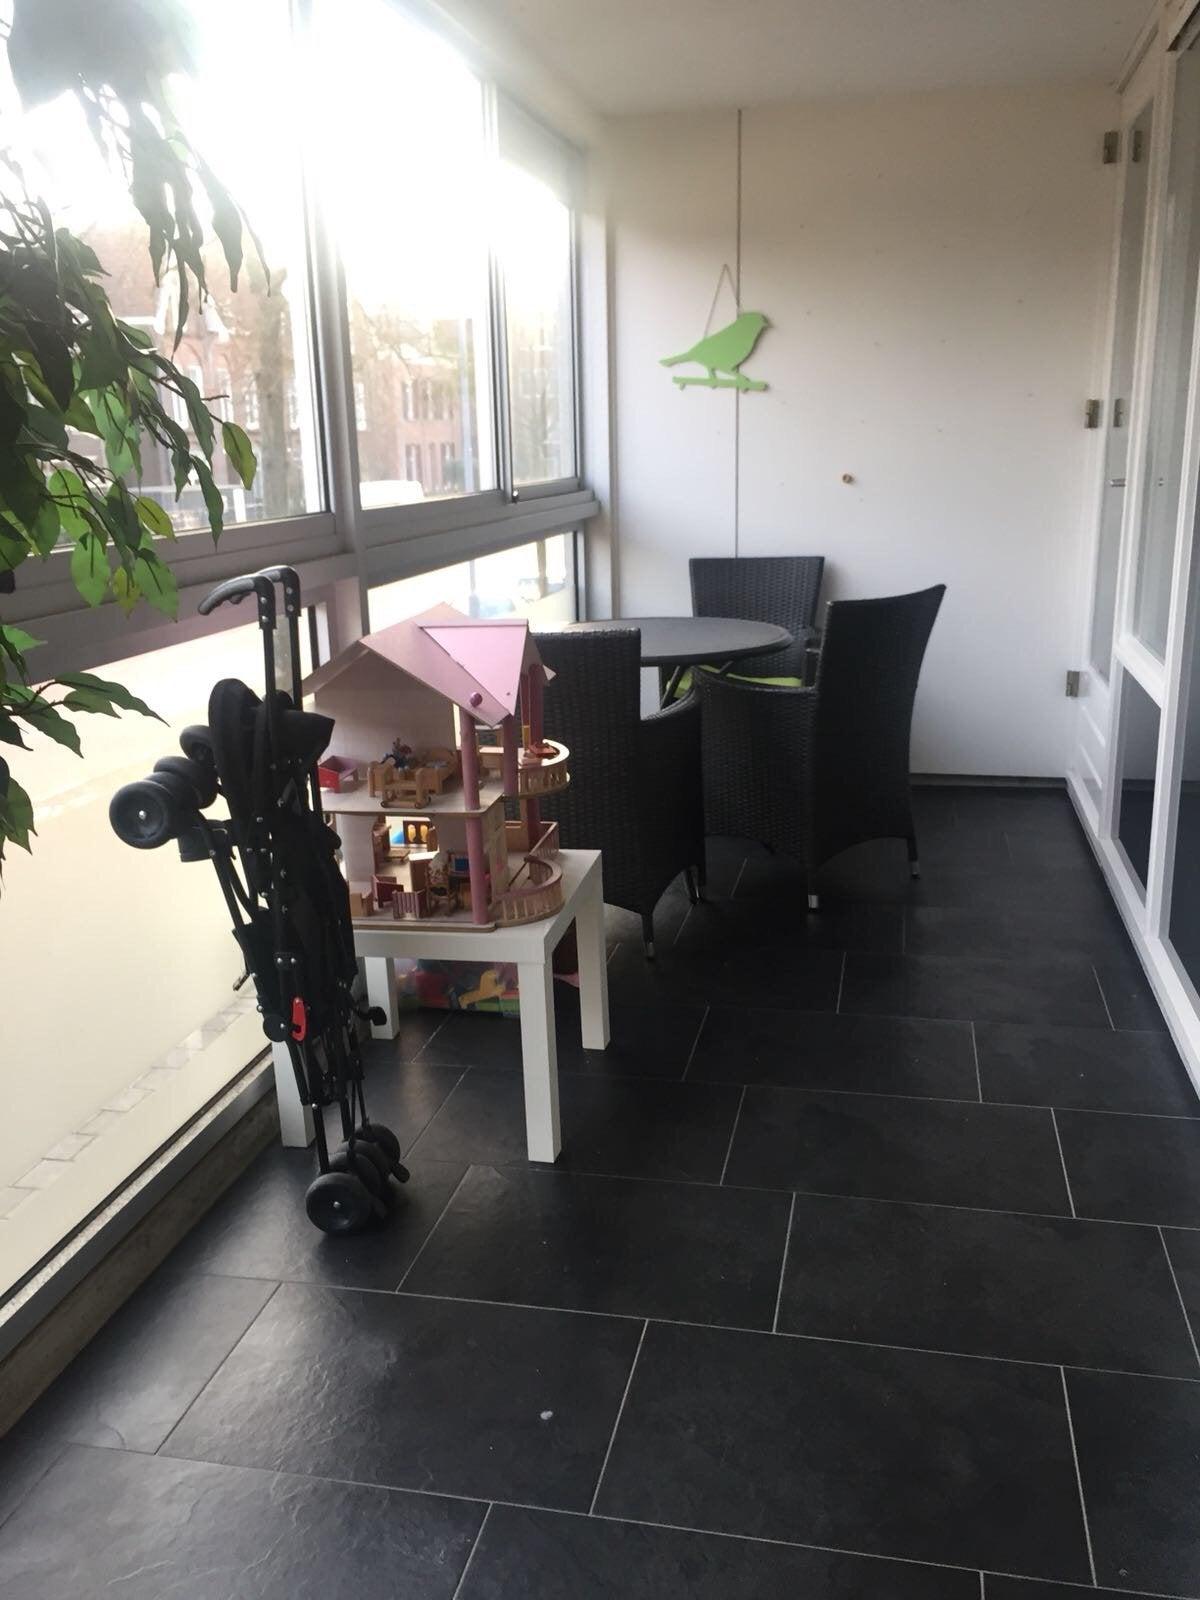 https://public.parariusoffice.nl/298/photos/huge/51563729.1518087857-152.JPG